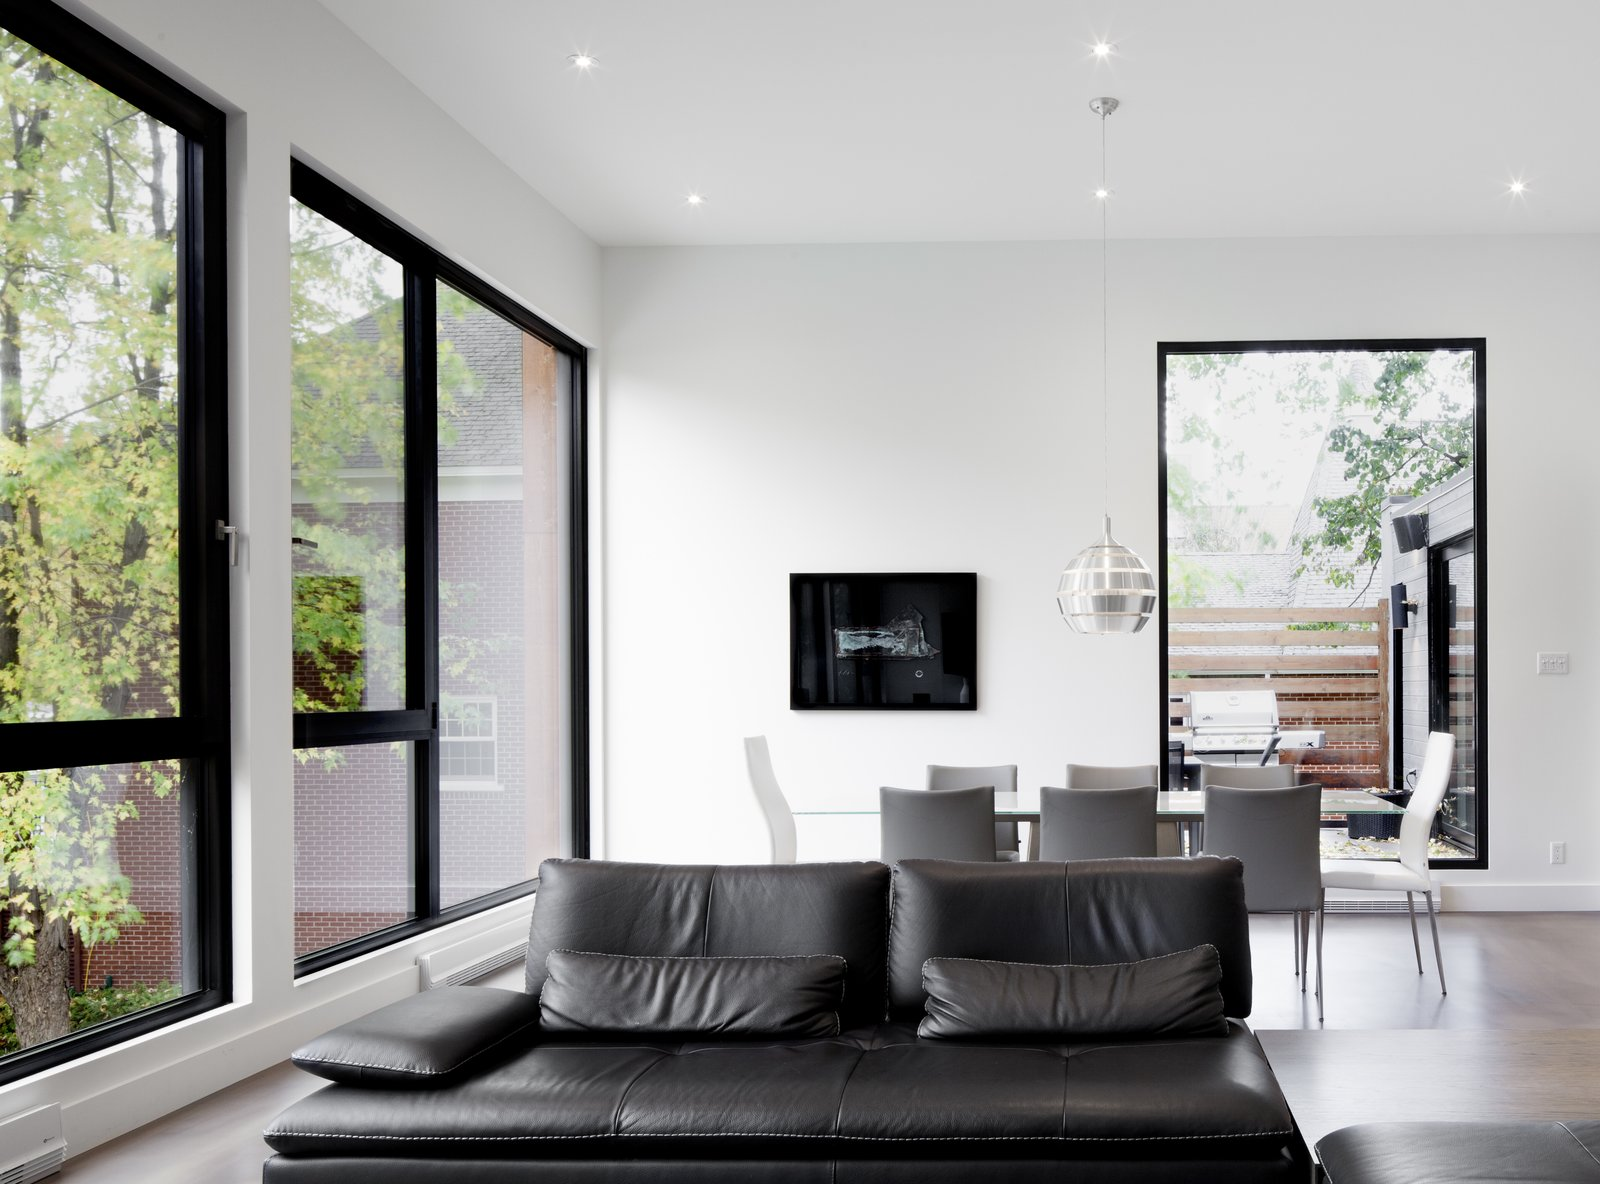 Dining room at Rue de l'Anse residence - PARKA Architecture & Design - Quebec city, Canada  Rue de l'Anse residence by PARKA - Architecture & Design